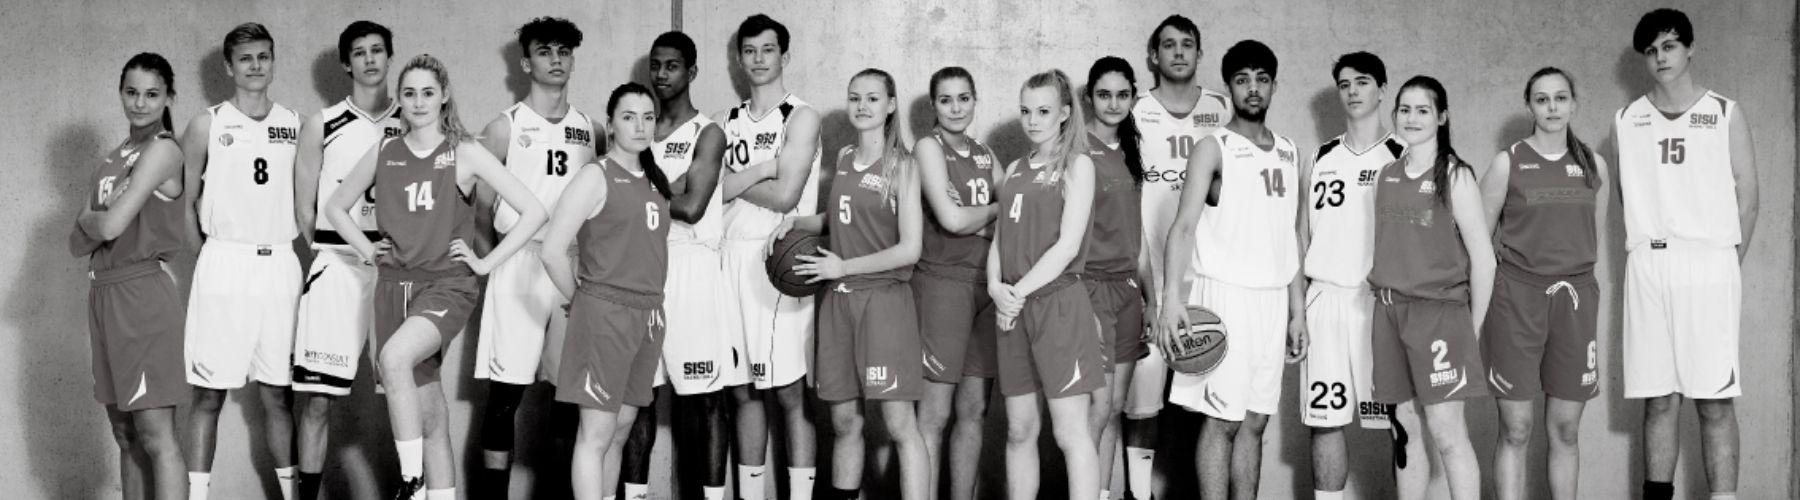 SISU Basketball's medieportal cover image